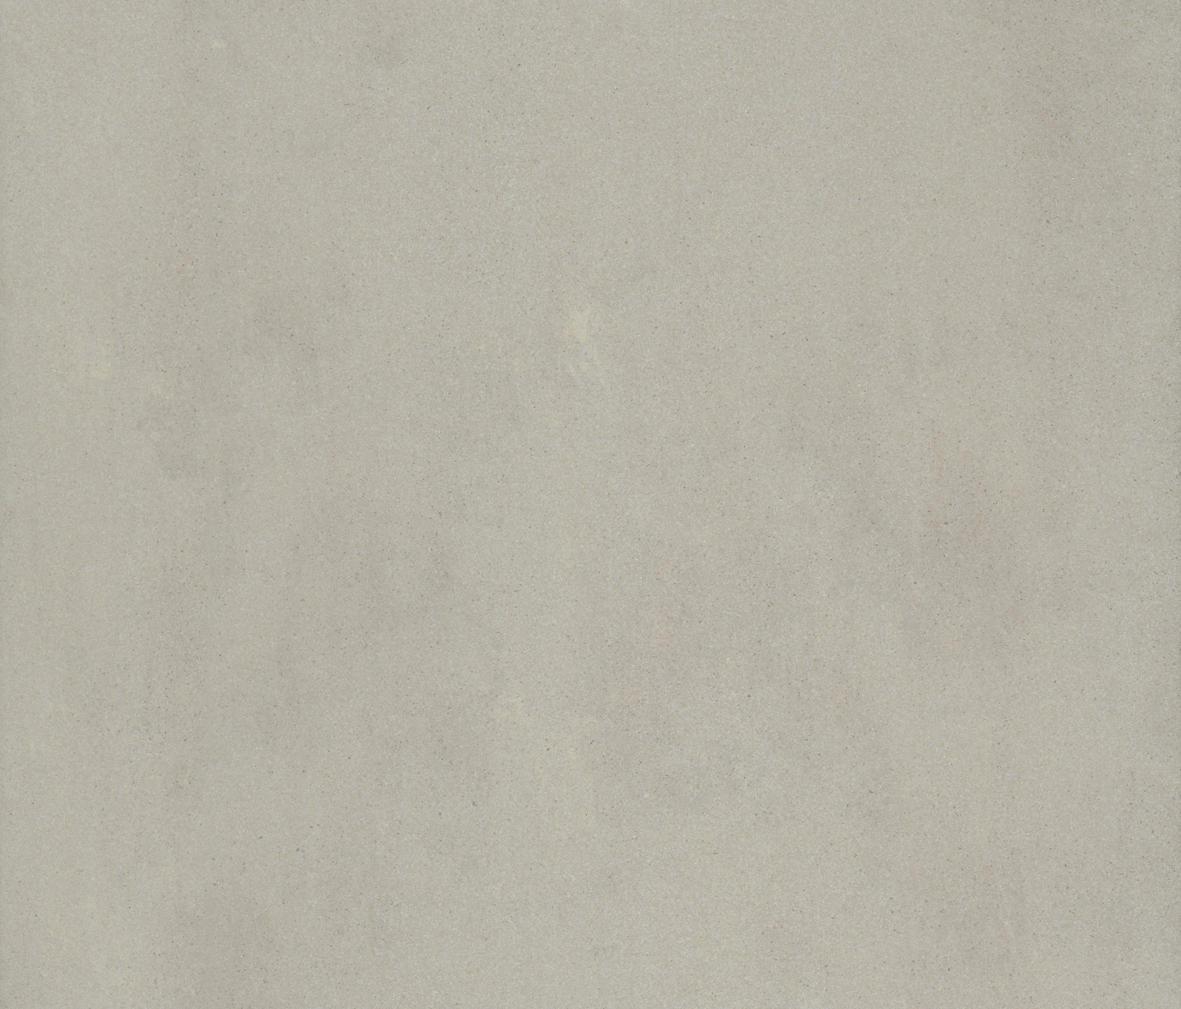 terra greys carrelage pour sol de mosa architonic. Black Bedroom Furniture Sets. Home Design Ideas